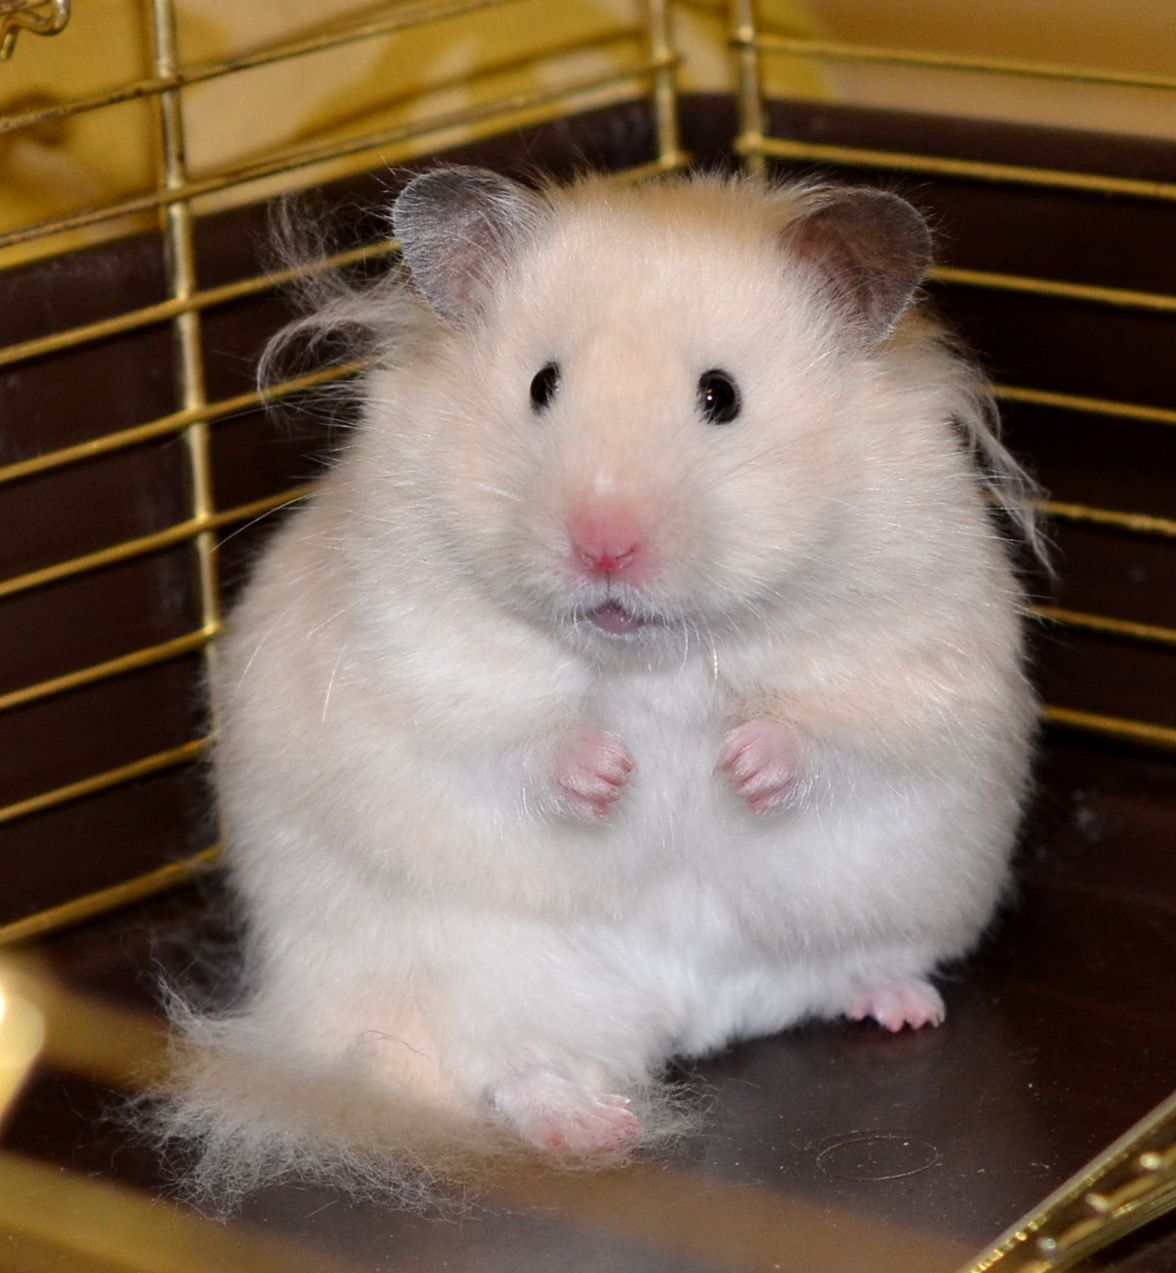 Greta Gwendolyn Long Haired Off White Female C J Johtela Funny Hamsters Syrian Hamster Cute Hamsters